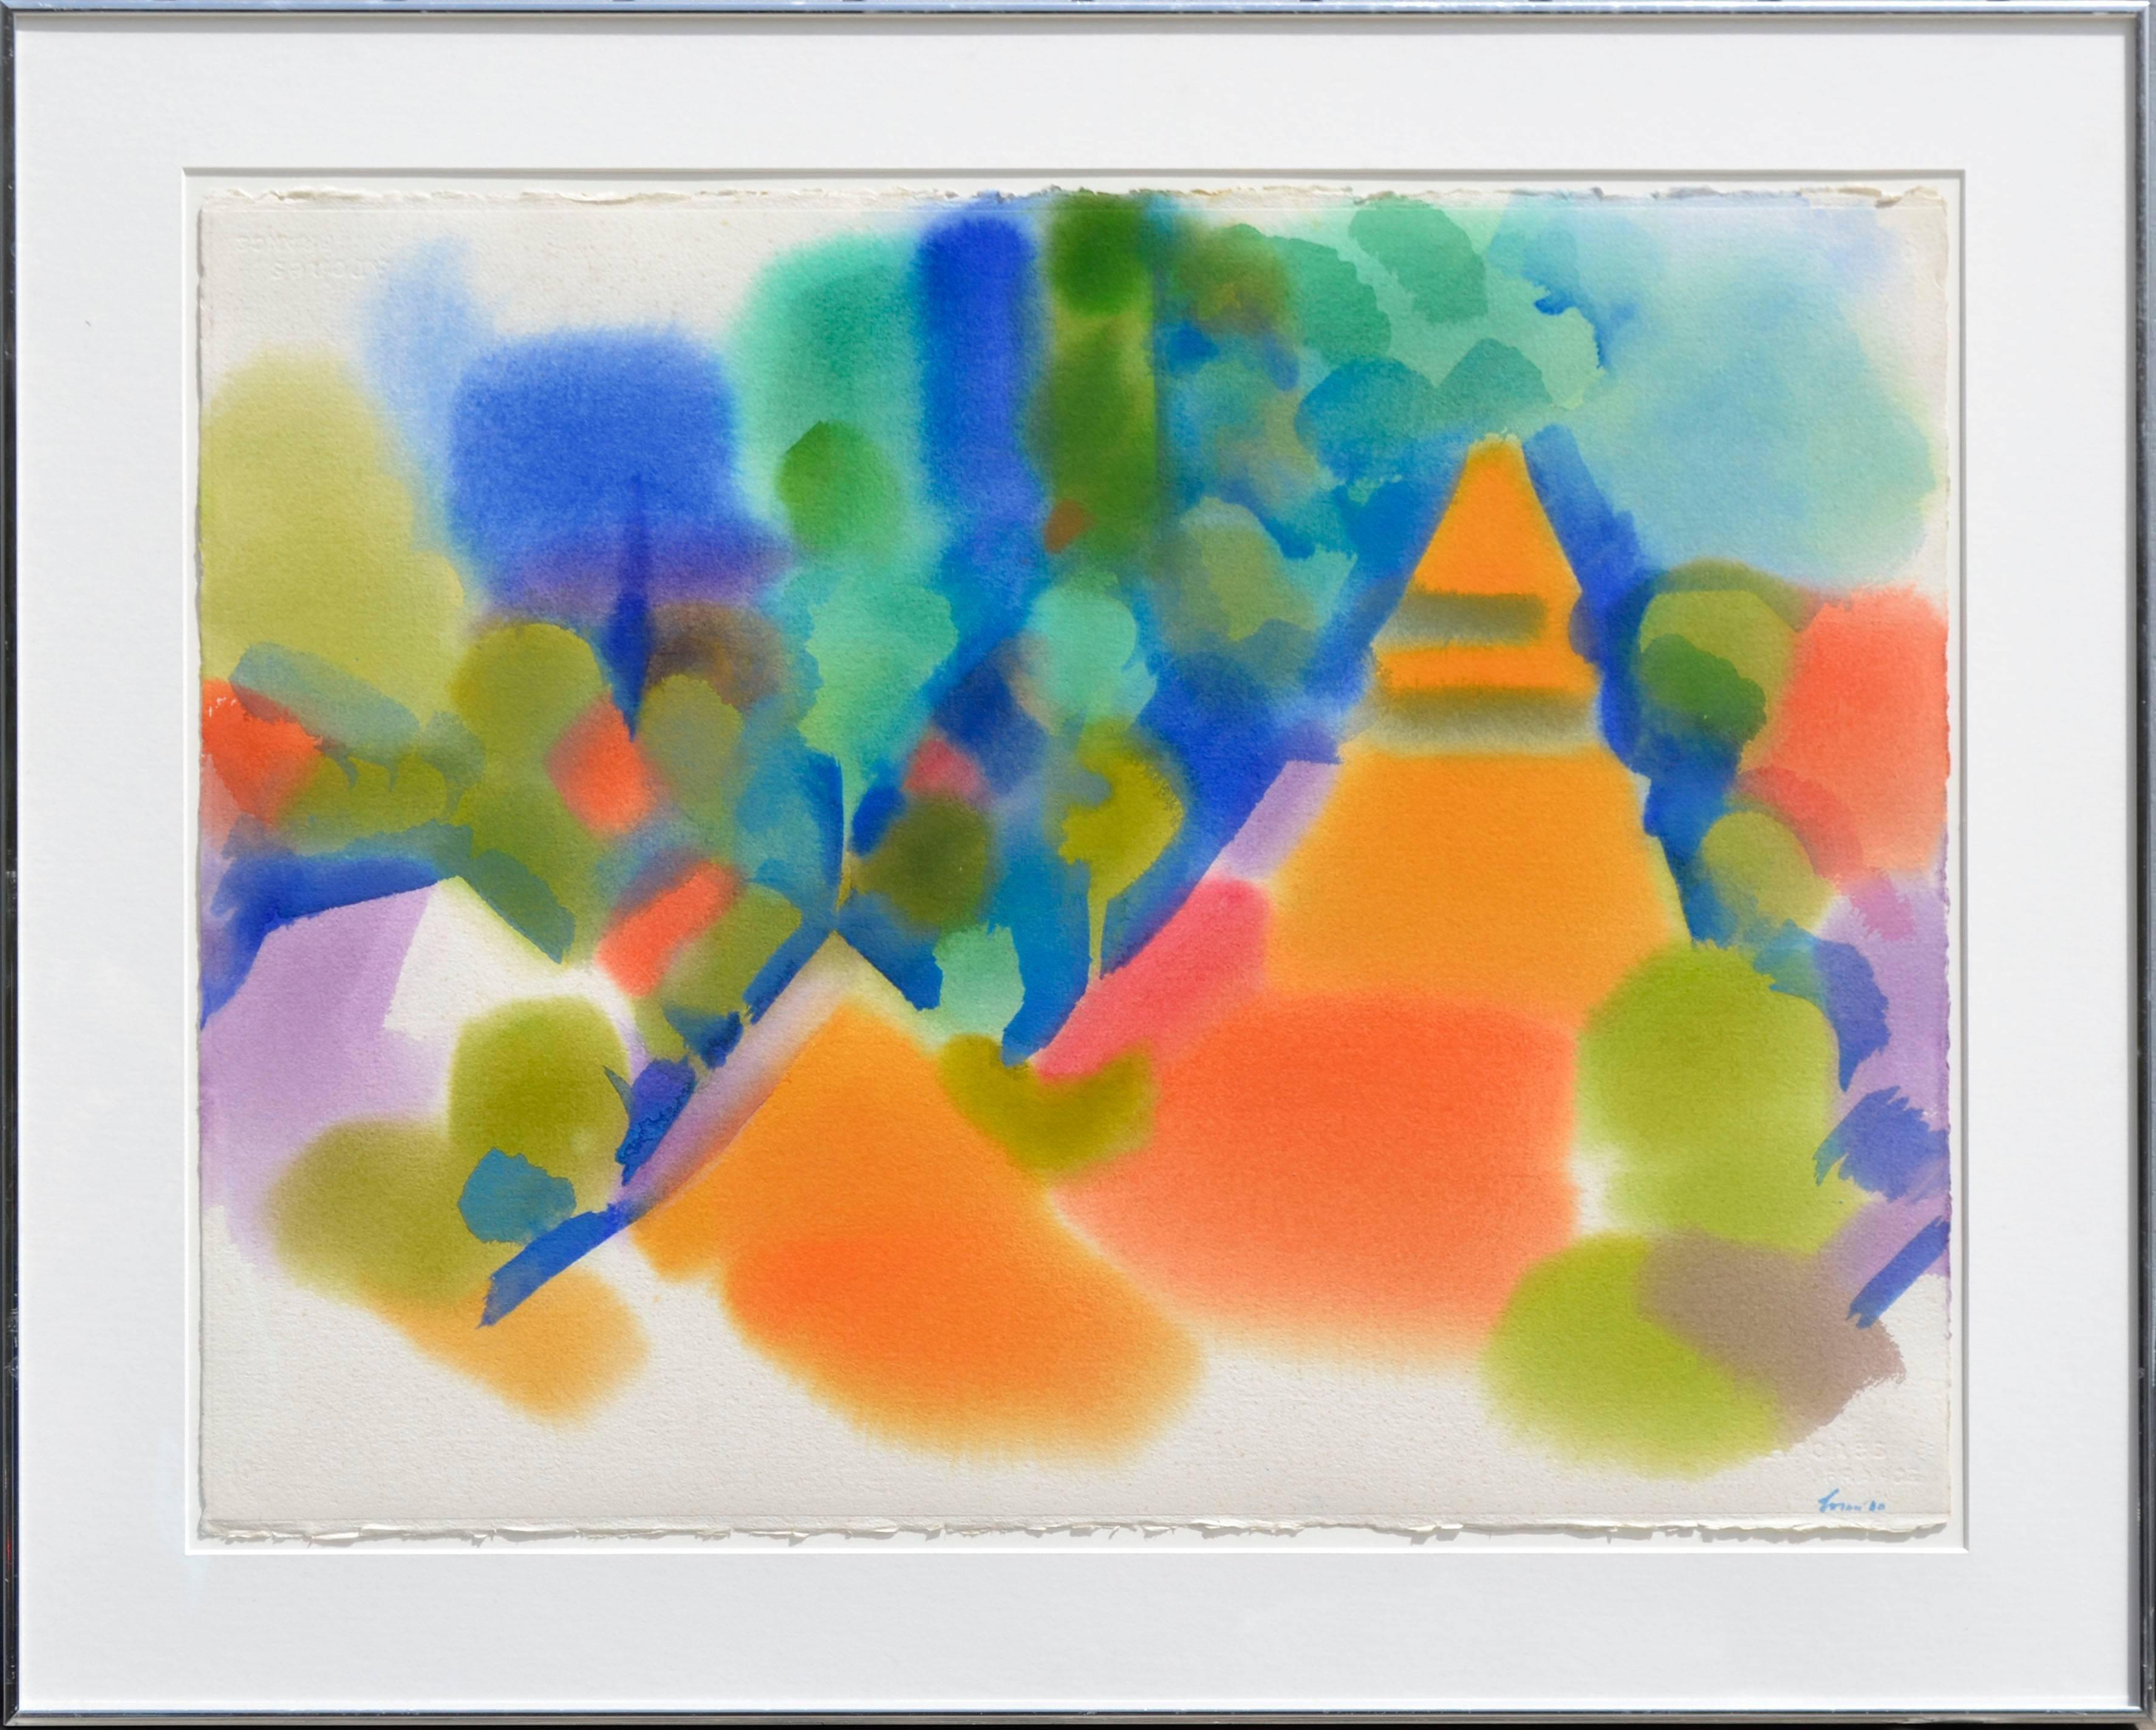 """Peaks Near Malakoff Diggins I"" - Abstract Geometric Landscape Watercolor"